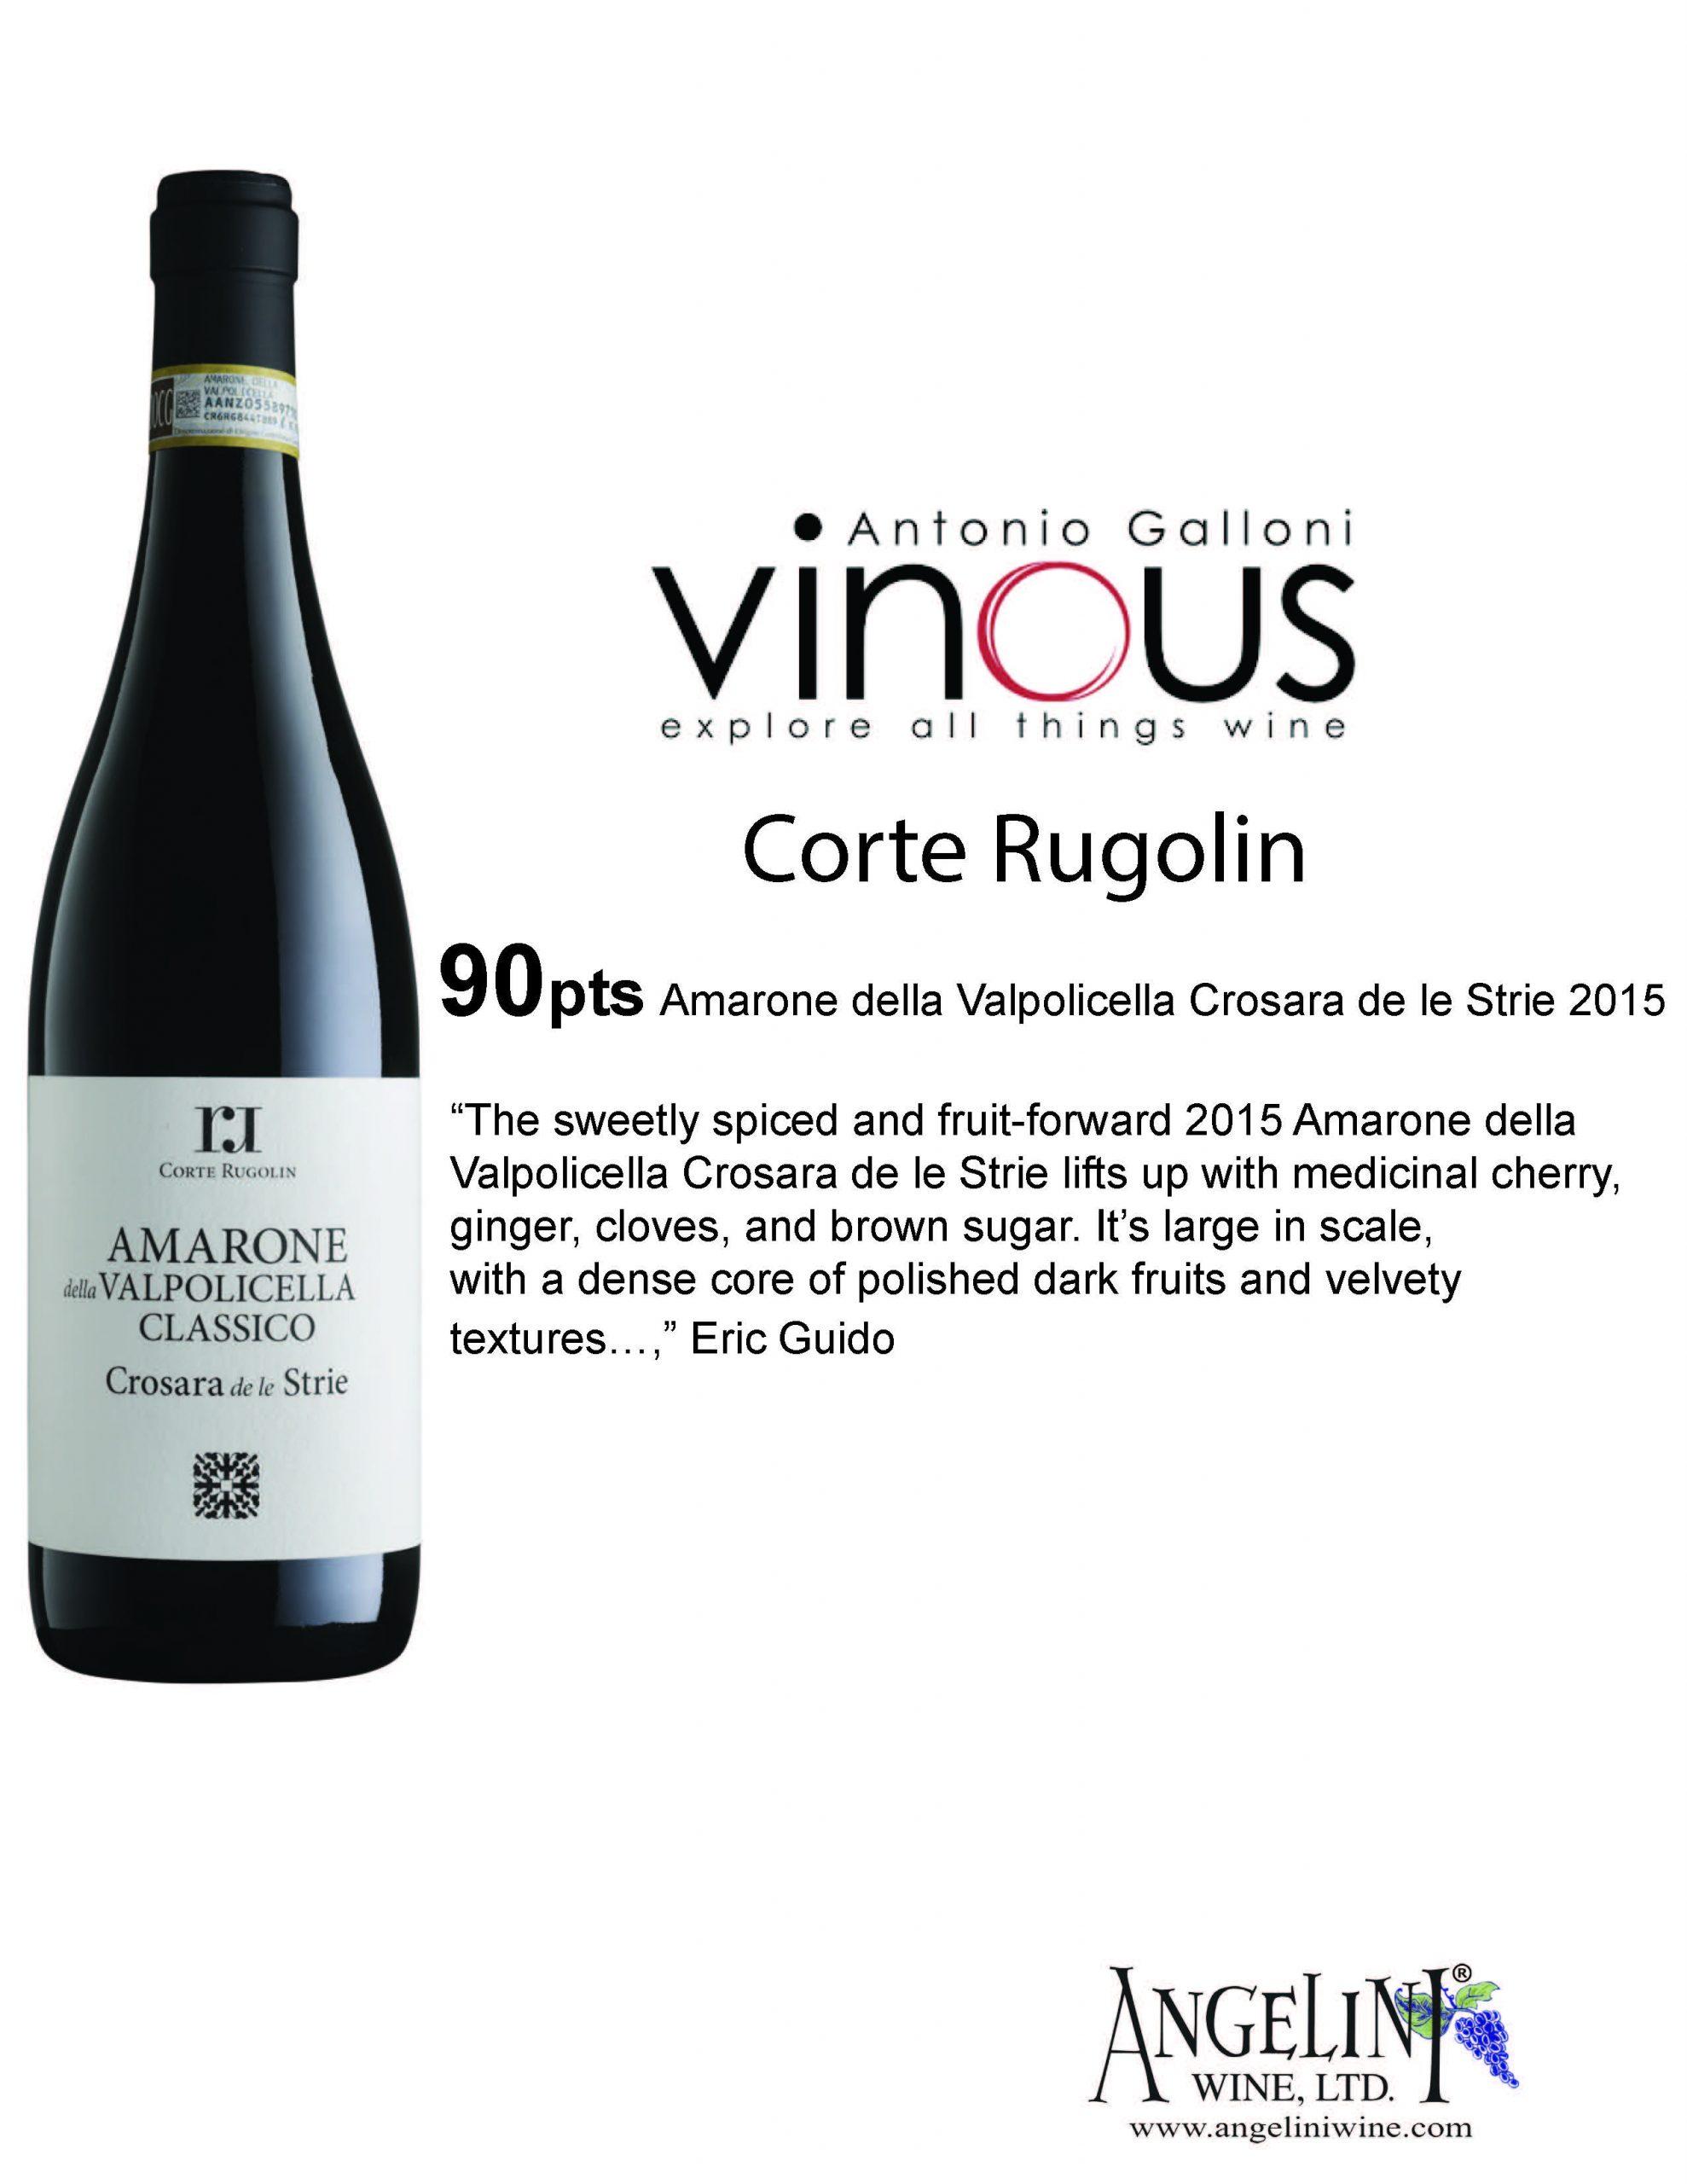 https://www.angeliniwine.com/wp-content/uploads/2021/02/Corte-Rugolin-2015-Amarone-Vinous-90-scaled.jpg